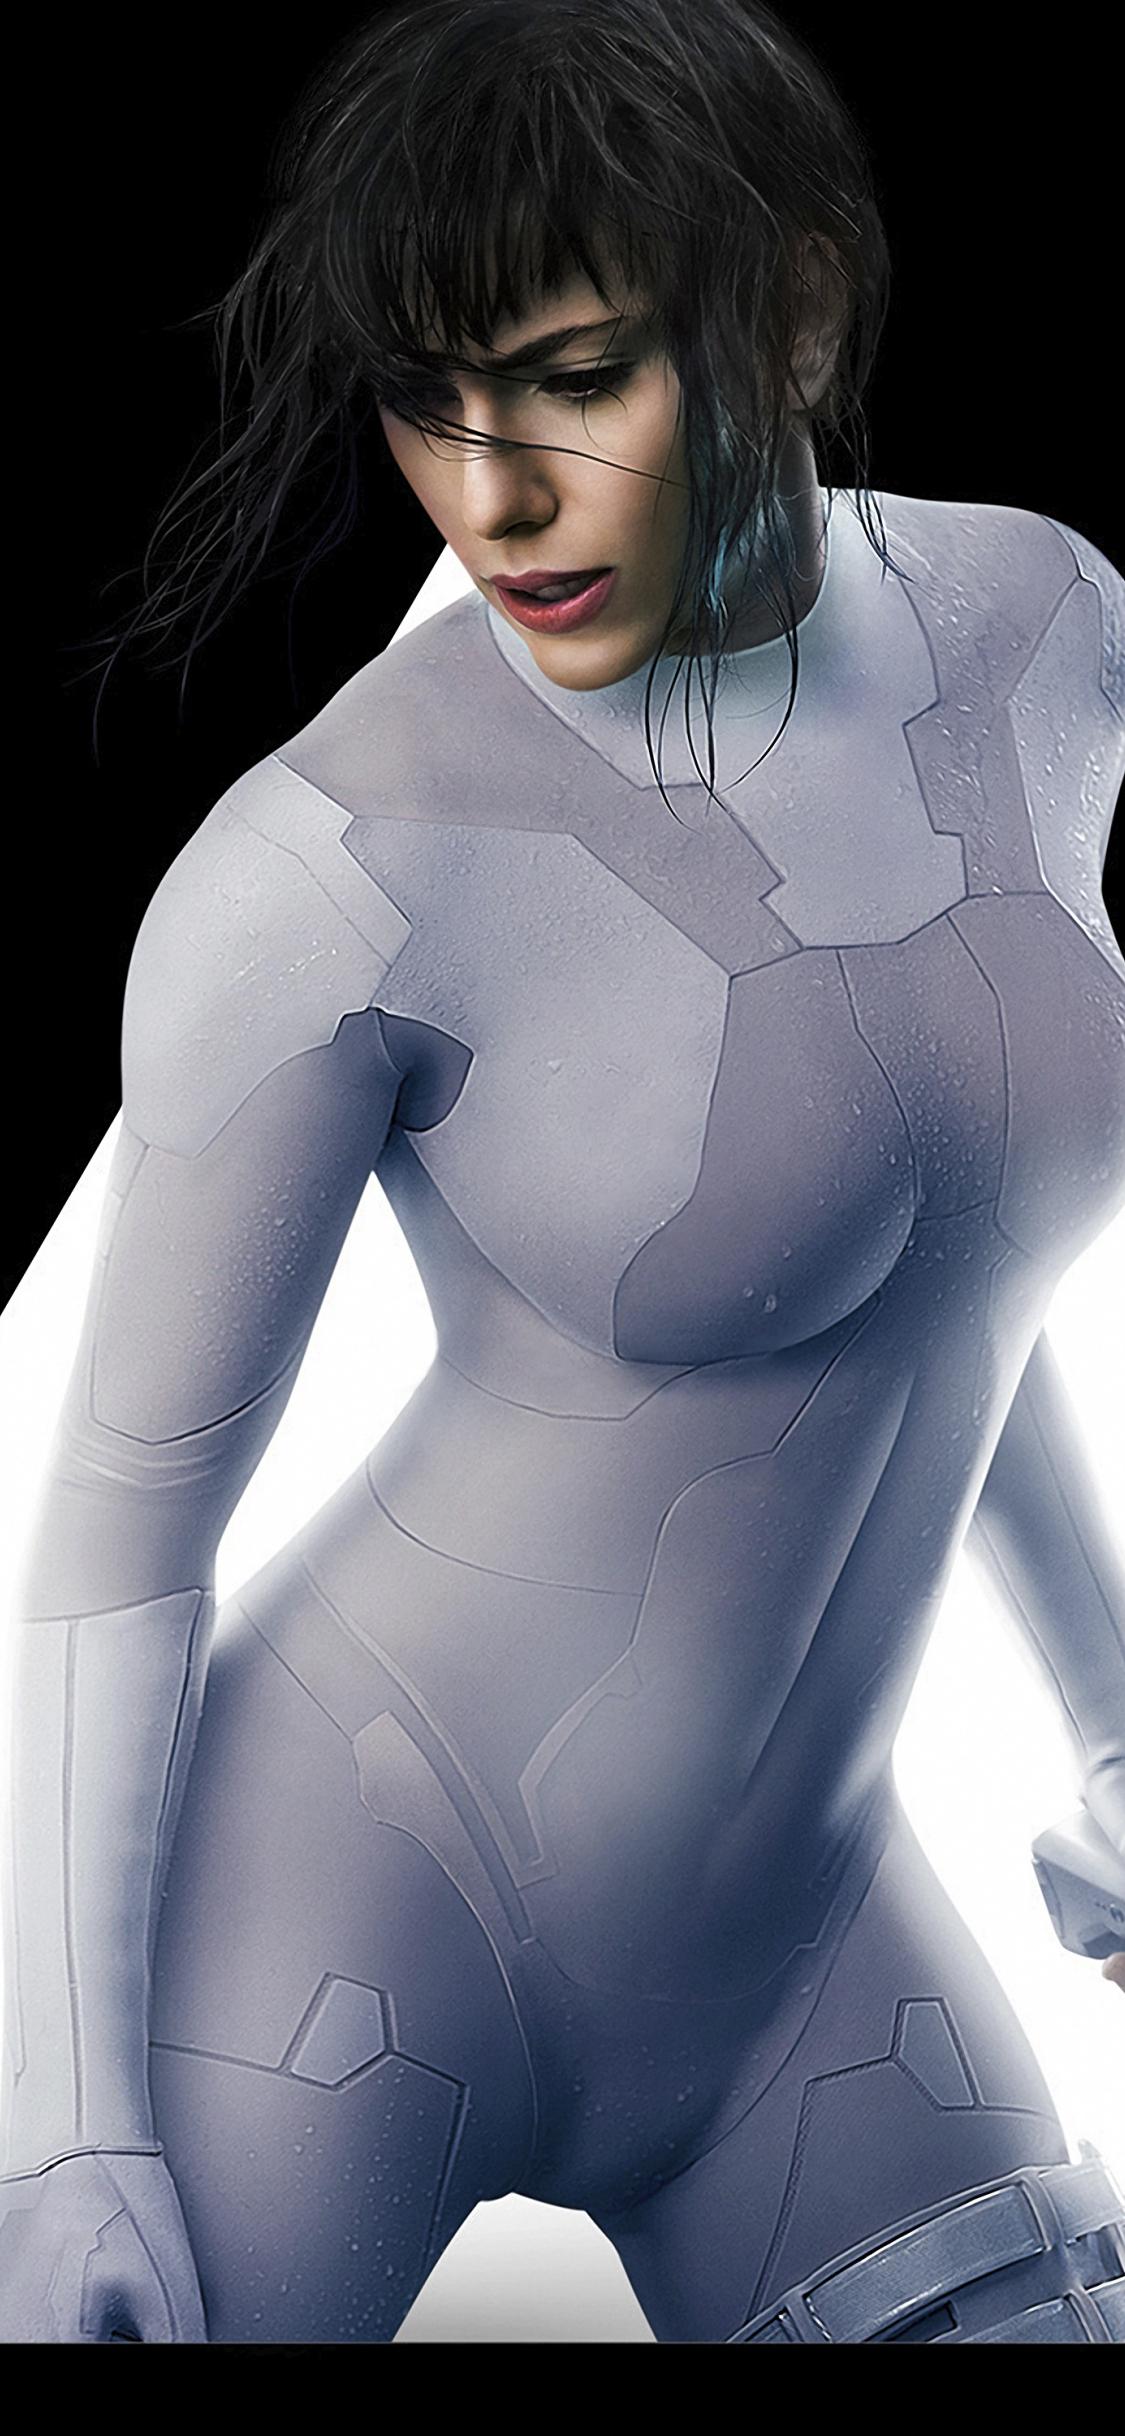 Scarlett Johansson Ghost In The Shell Costume 1125x2436 Download Hd Wallpaper Wallpapertip